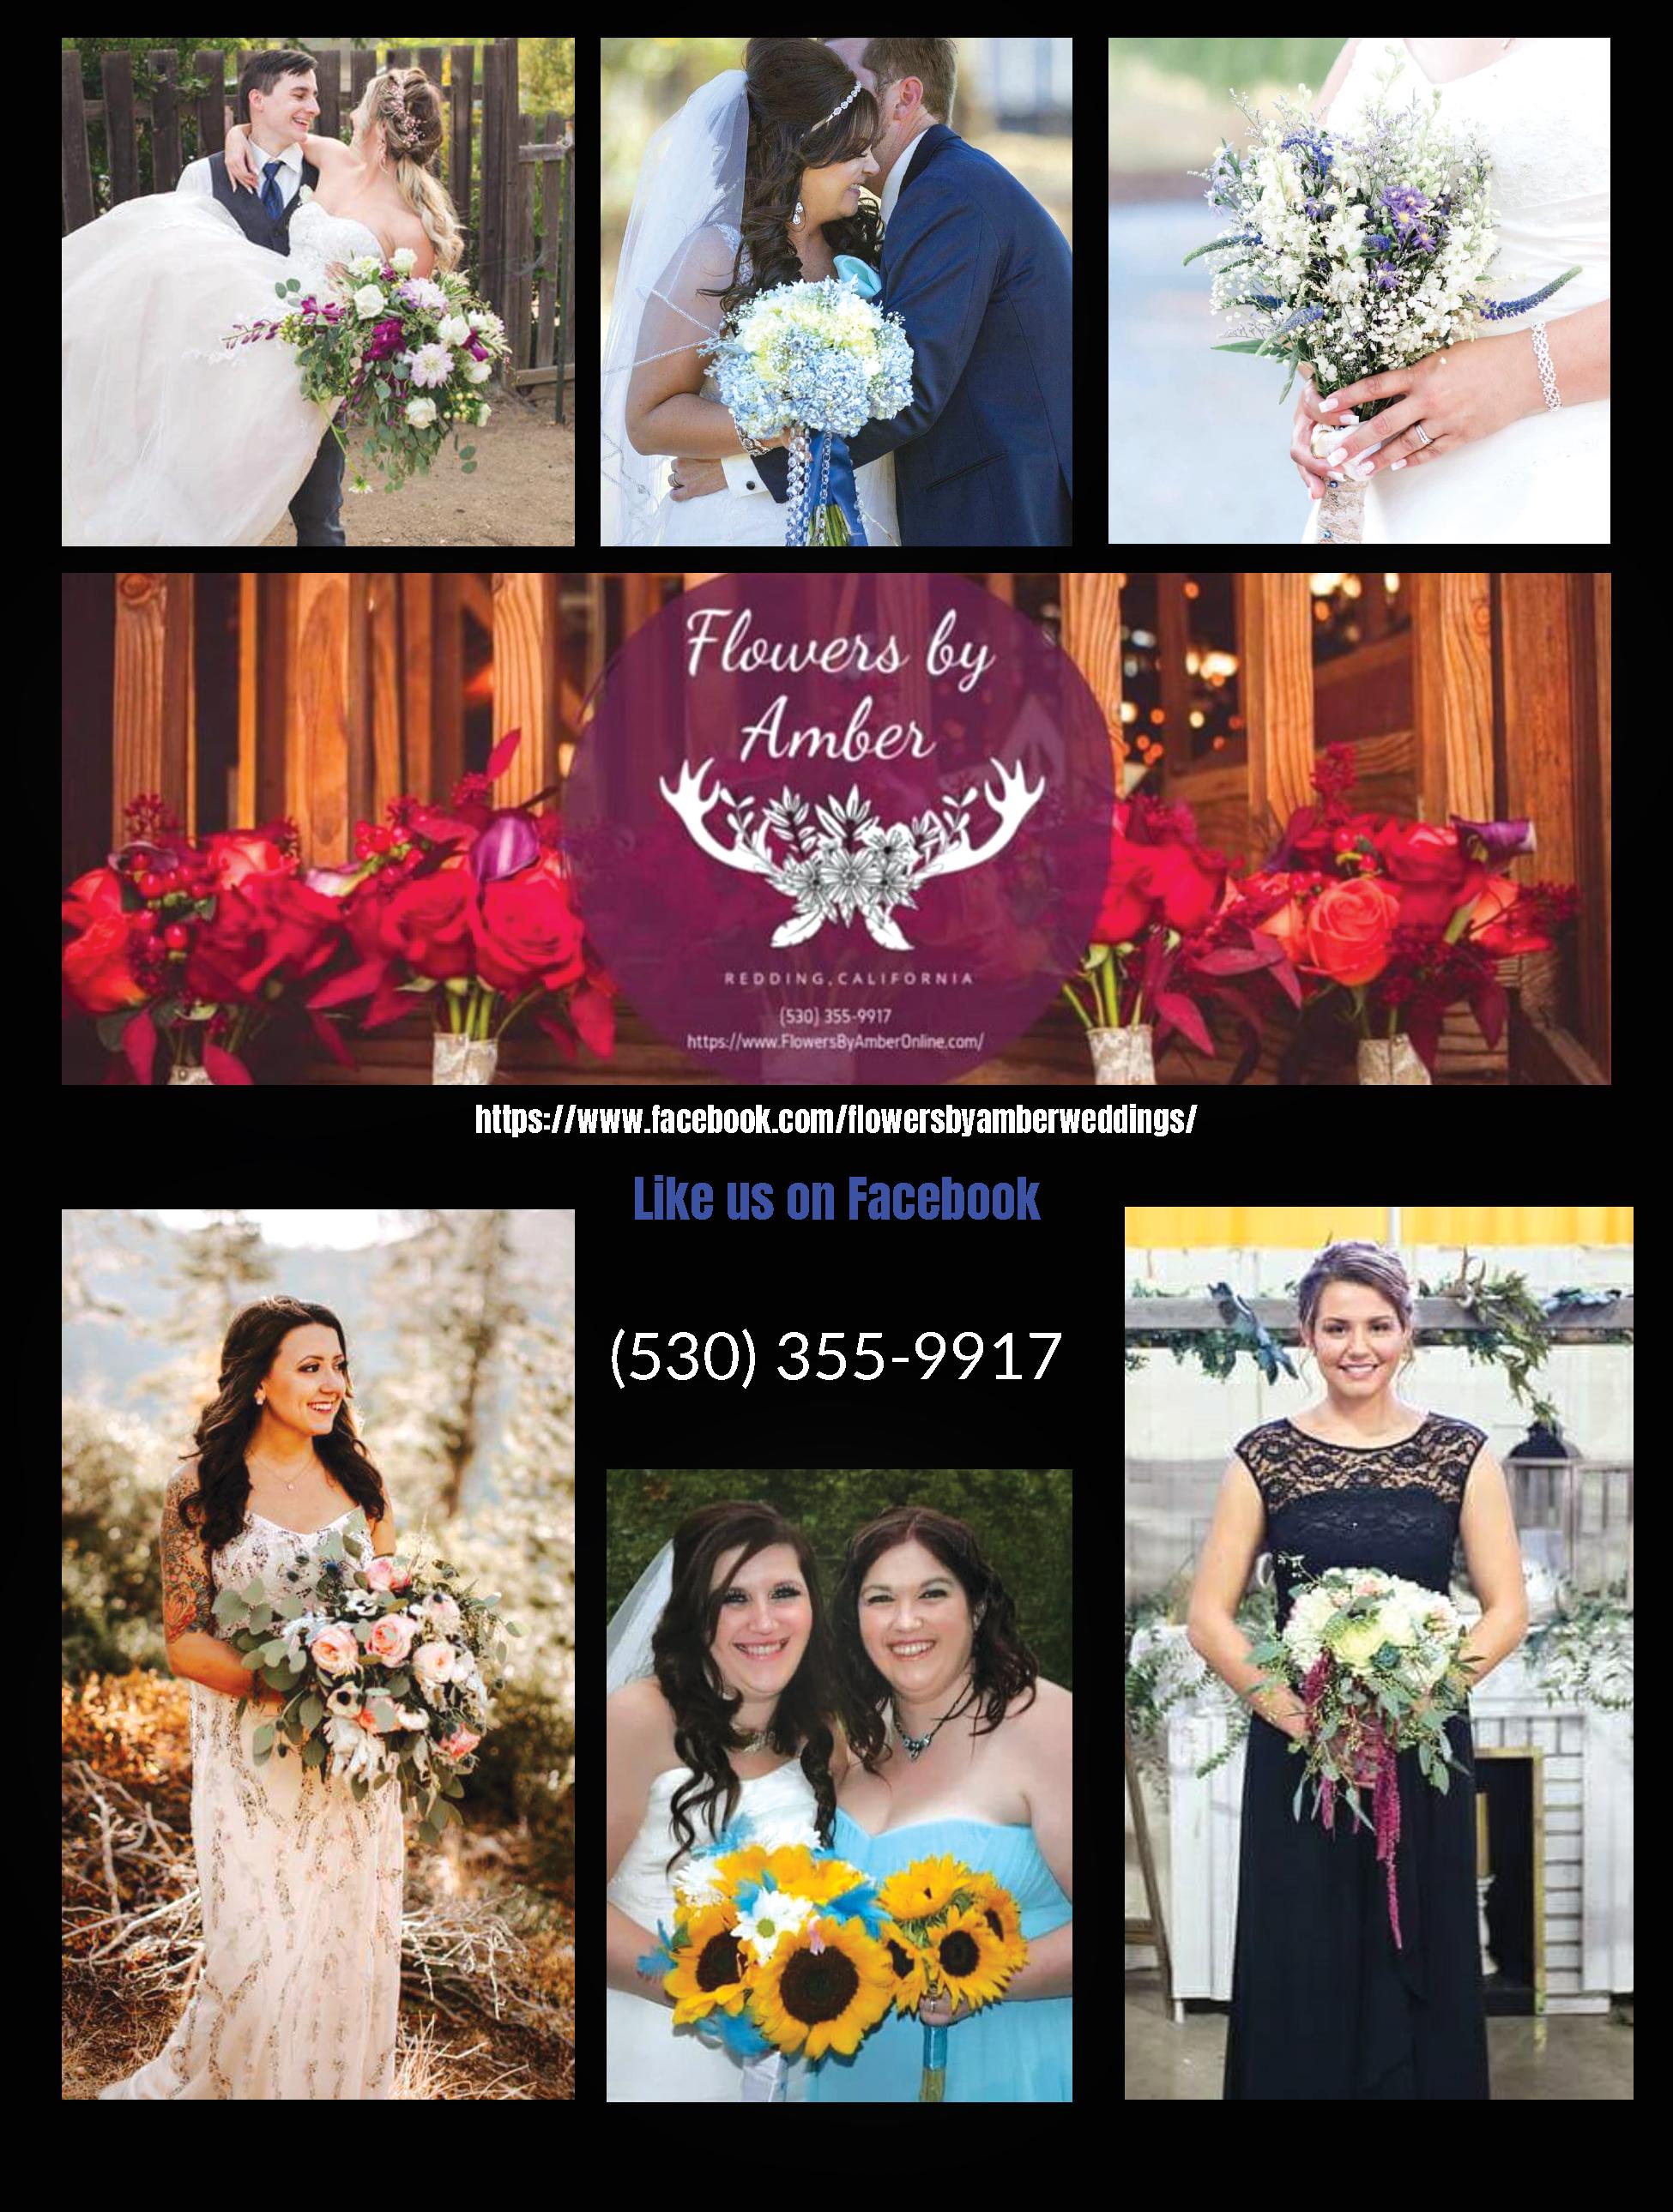 Flowers by Amber Redding Wedding florist.jpg